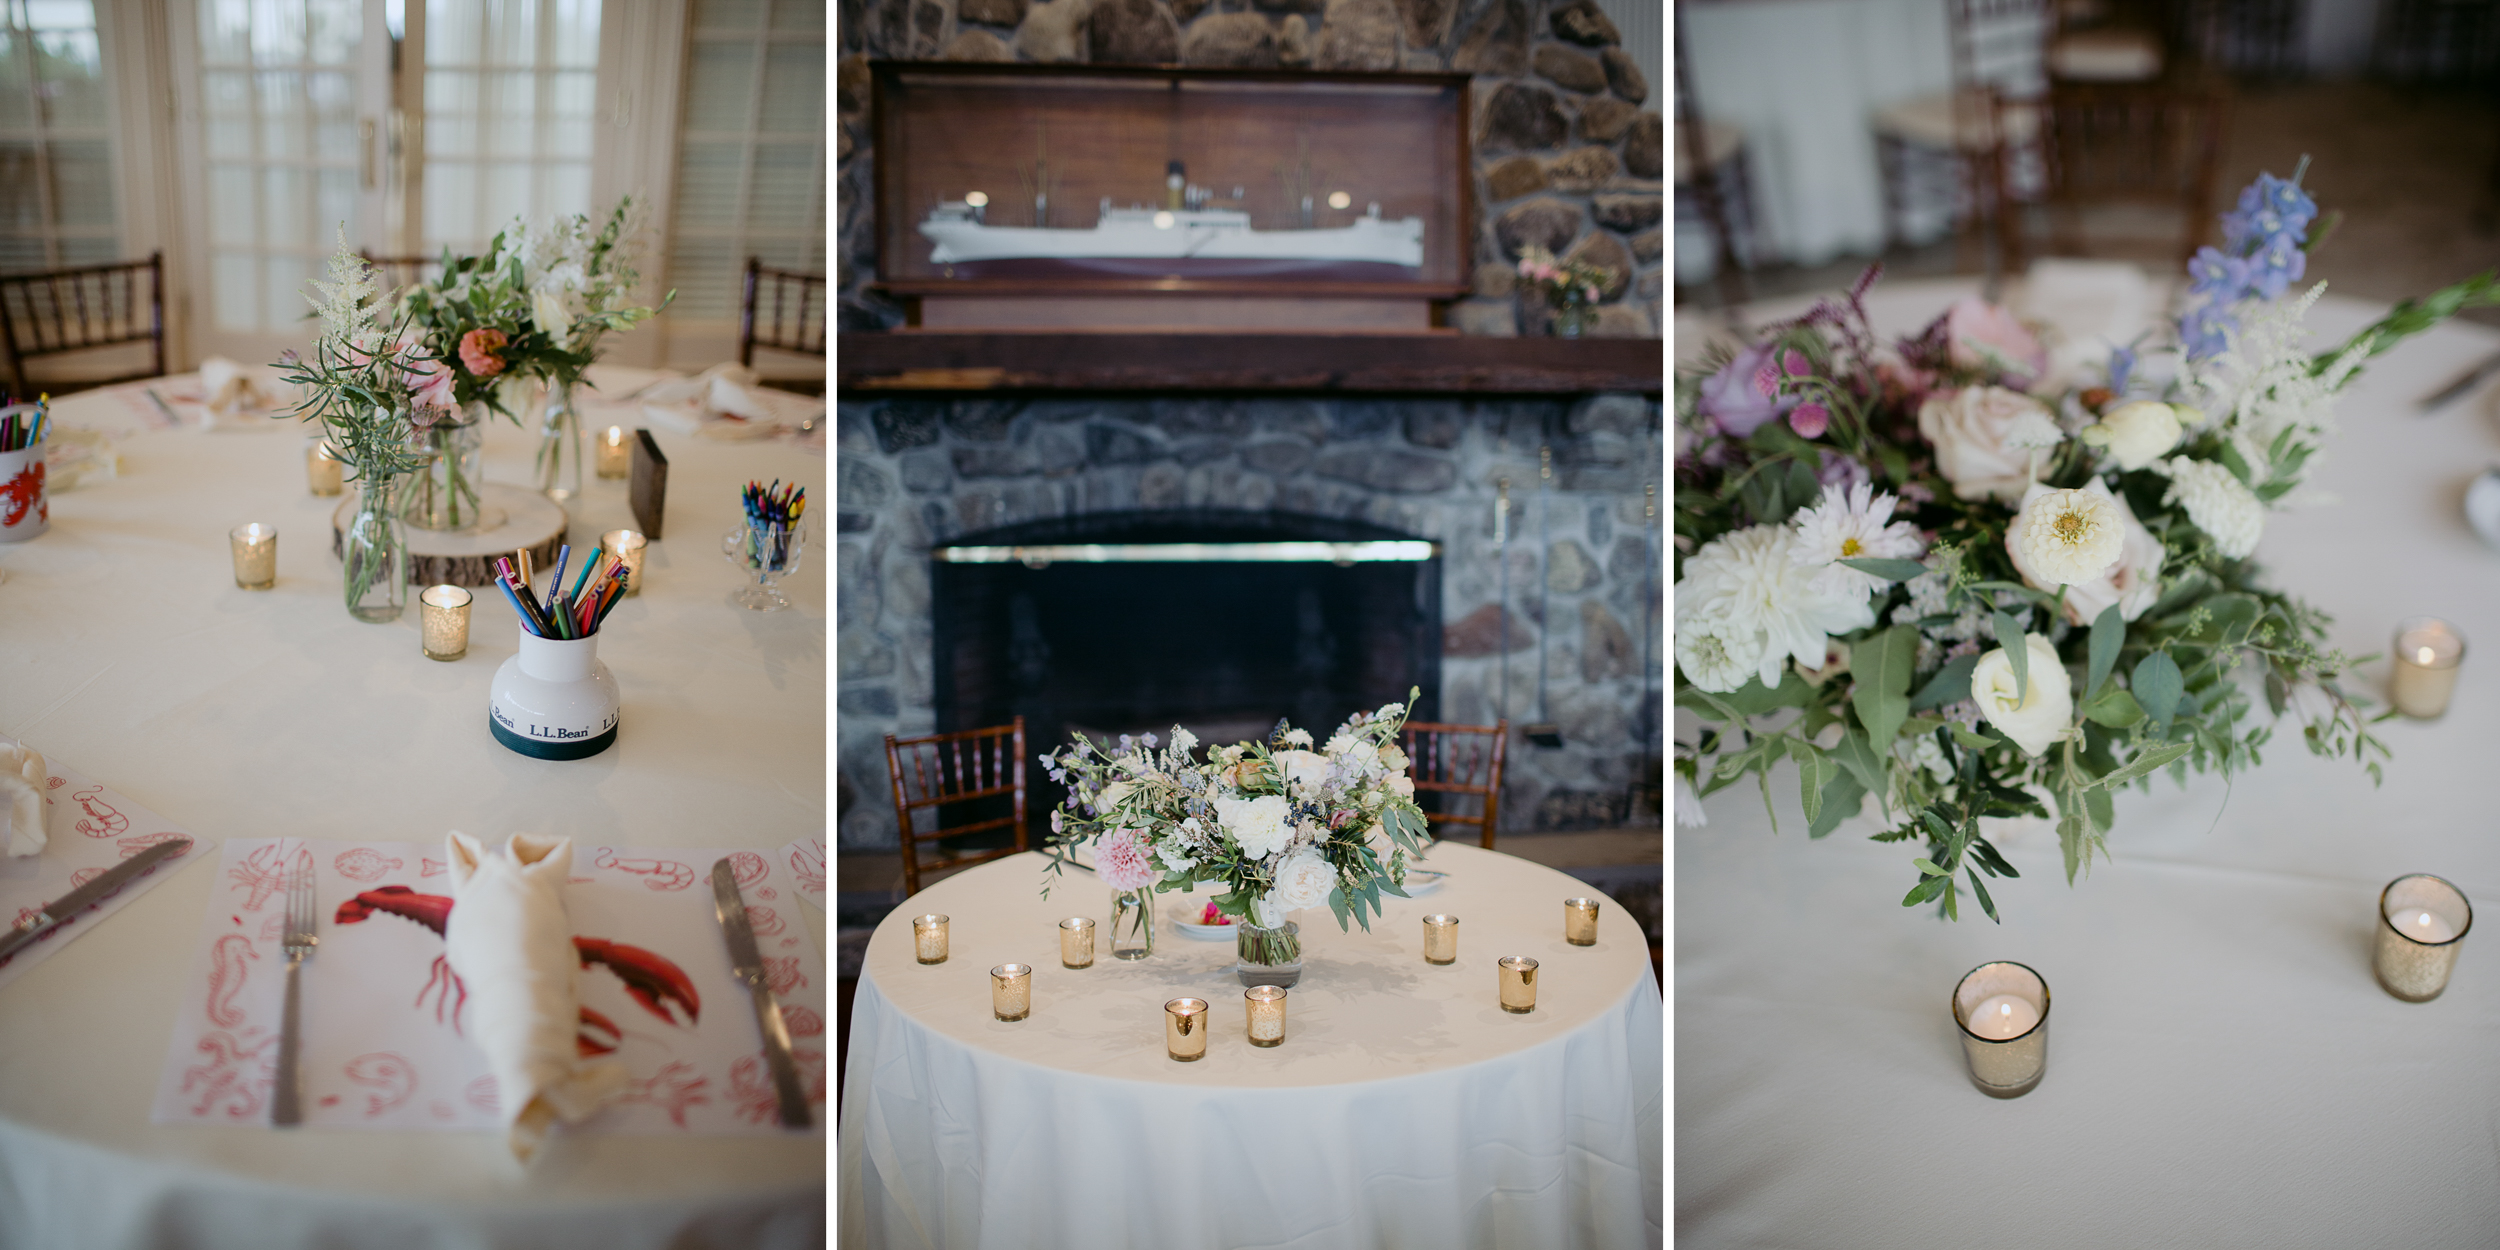 point_lookout_northport_Maine_Midcoast_wedding_leslie_justin-22.jpg